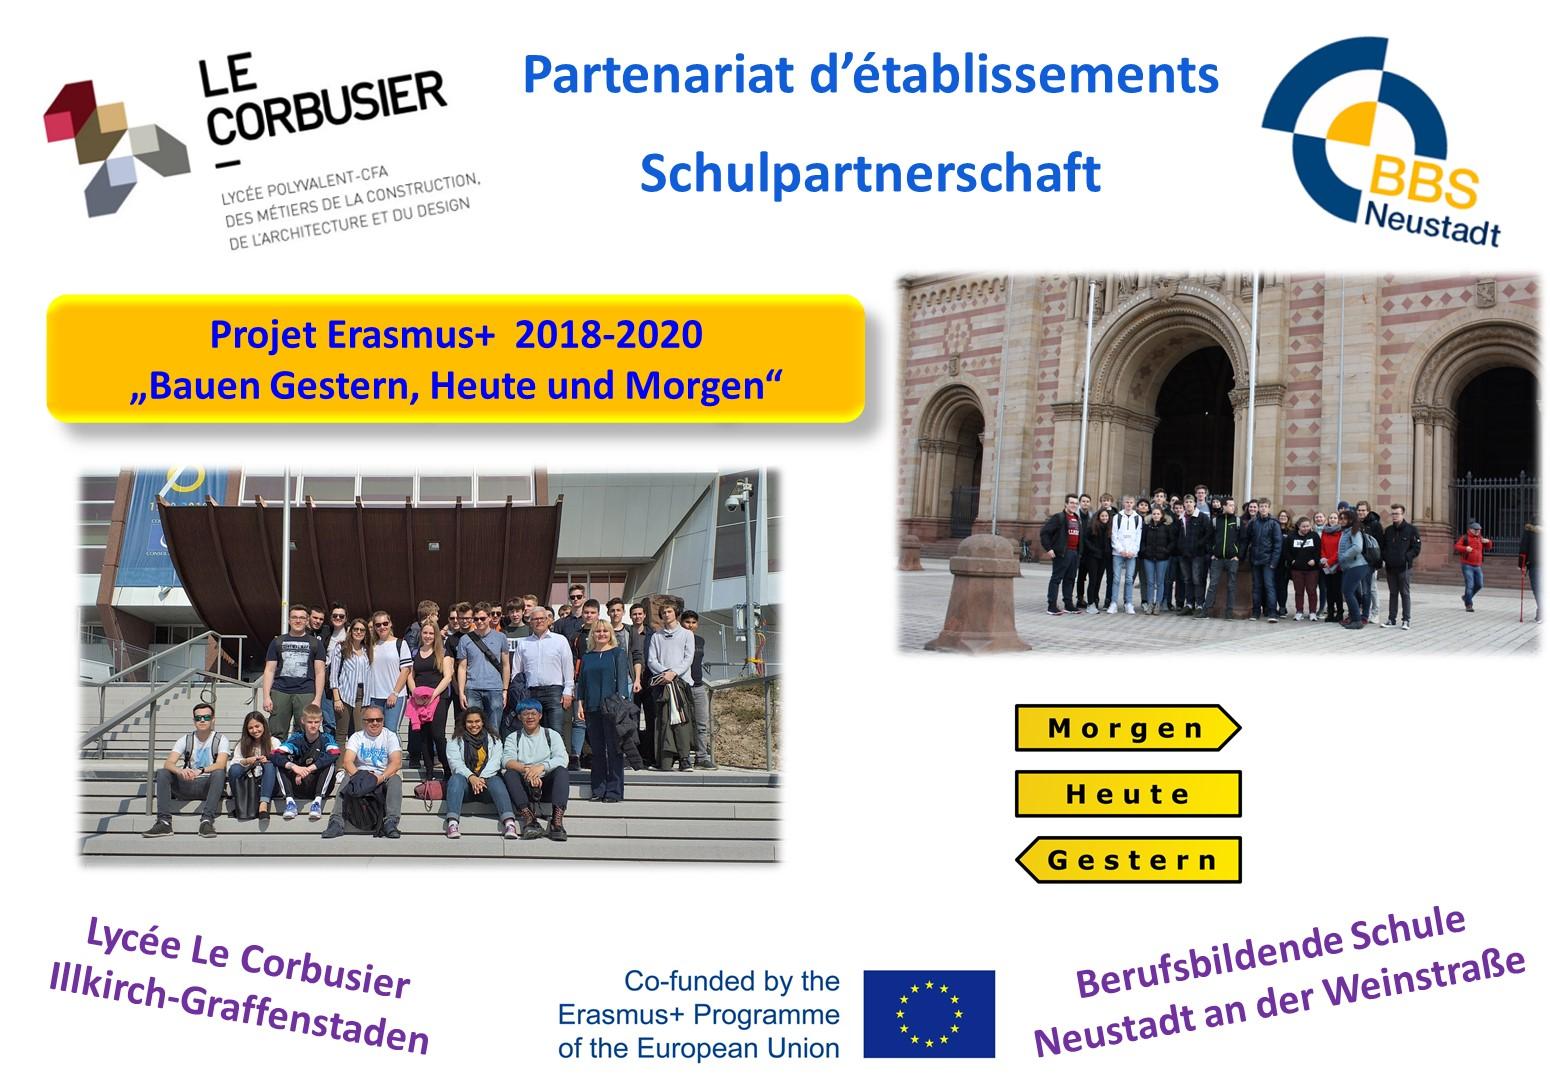 Partenariats-2018-2020-Bauen-Gestern-heute-morgen-Allemagne-Corbusier